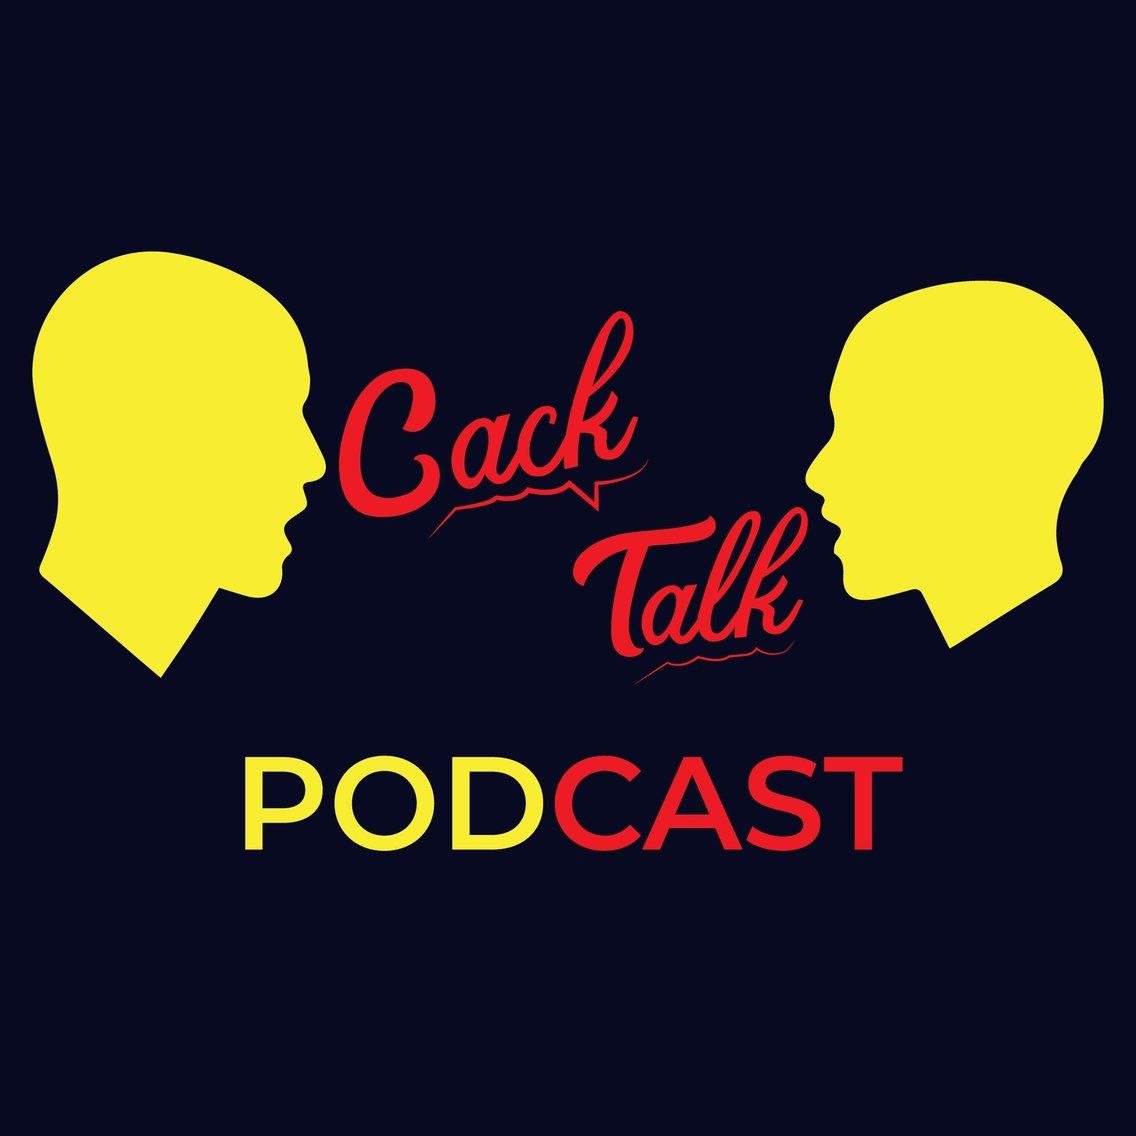 Cack Talk - Cover Image